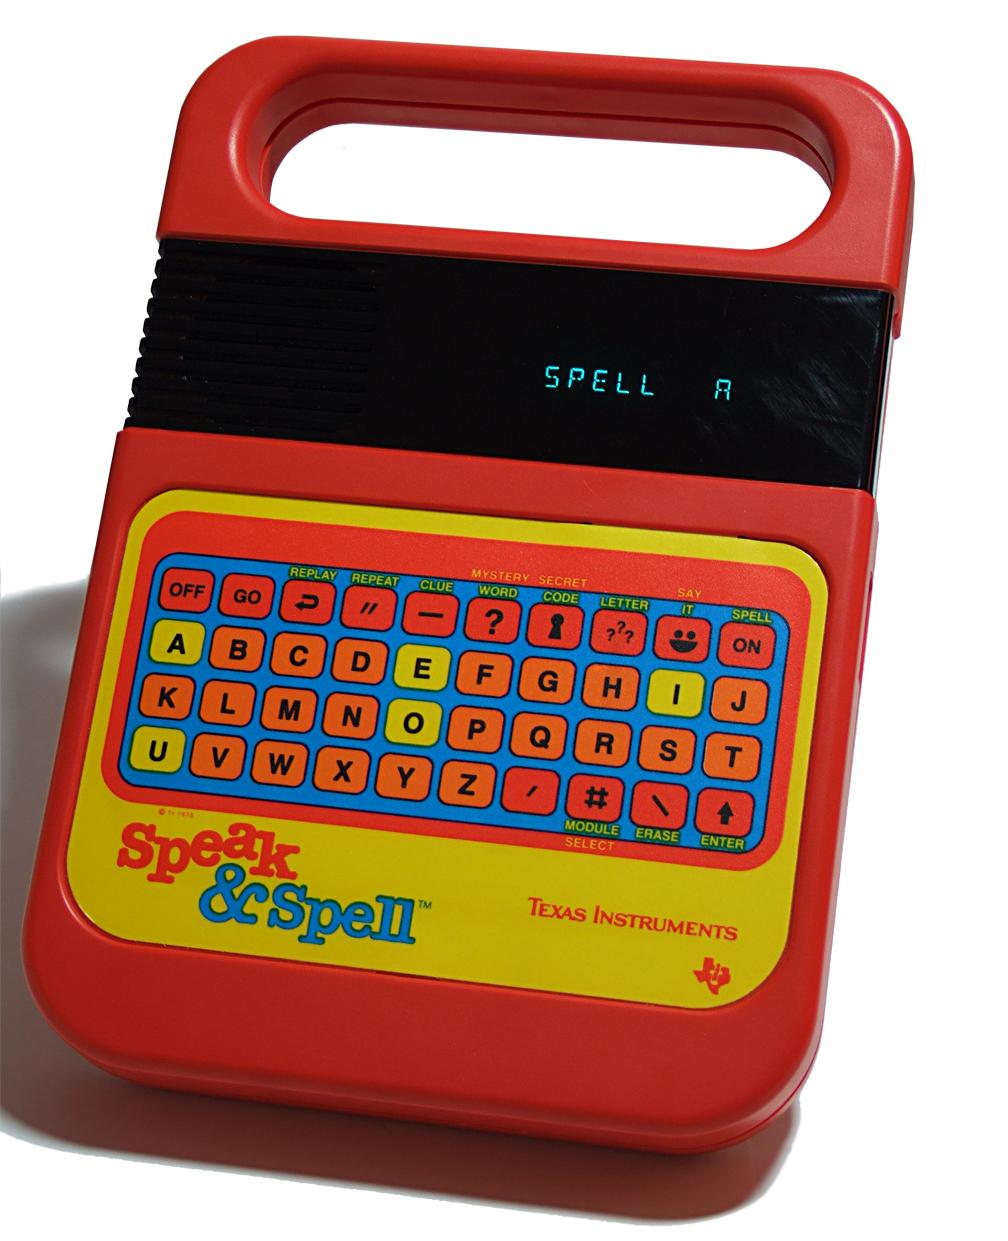 Texas Instruments Speak & Spell using a TMC0280 speech synthesizer.